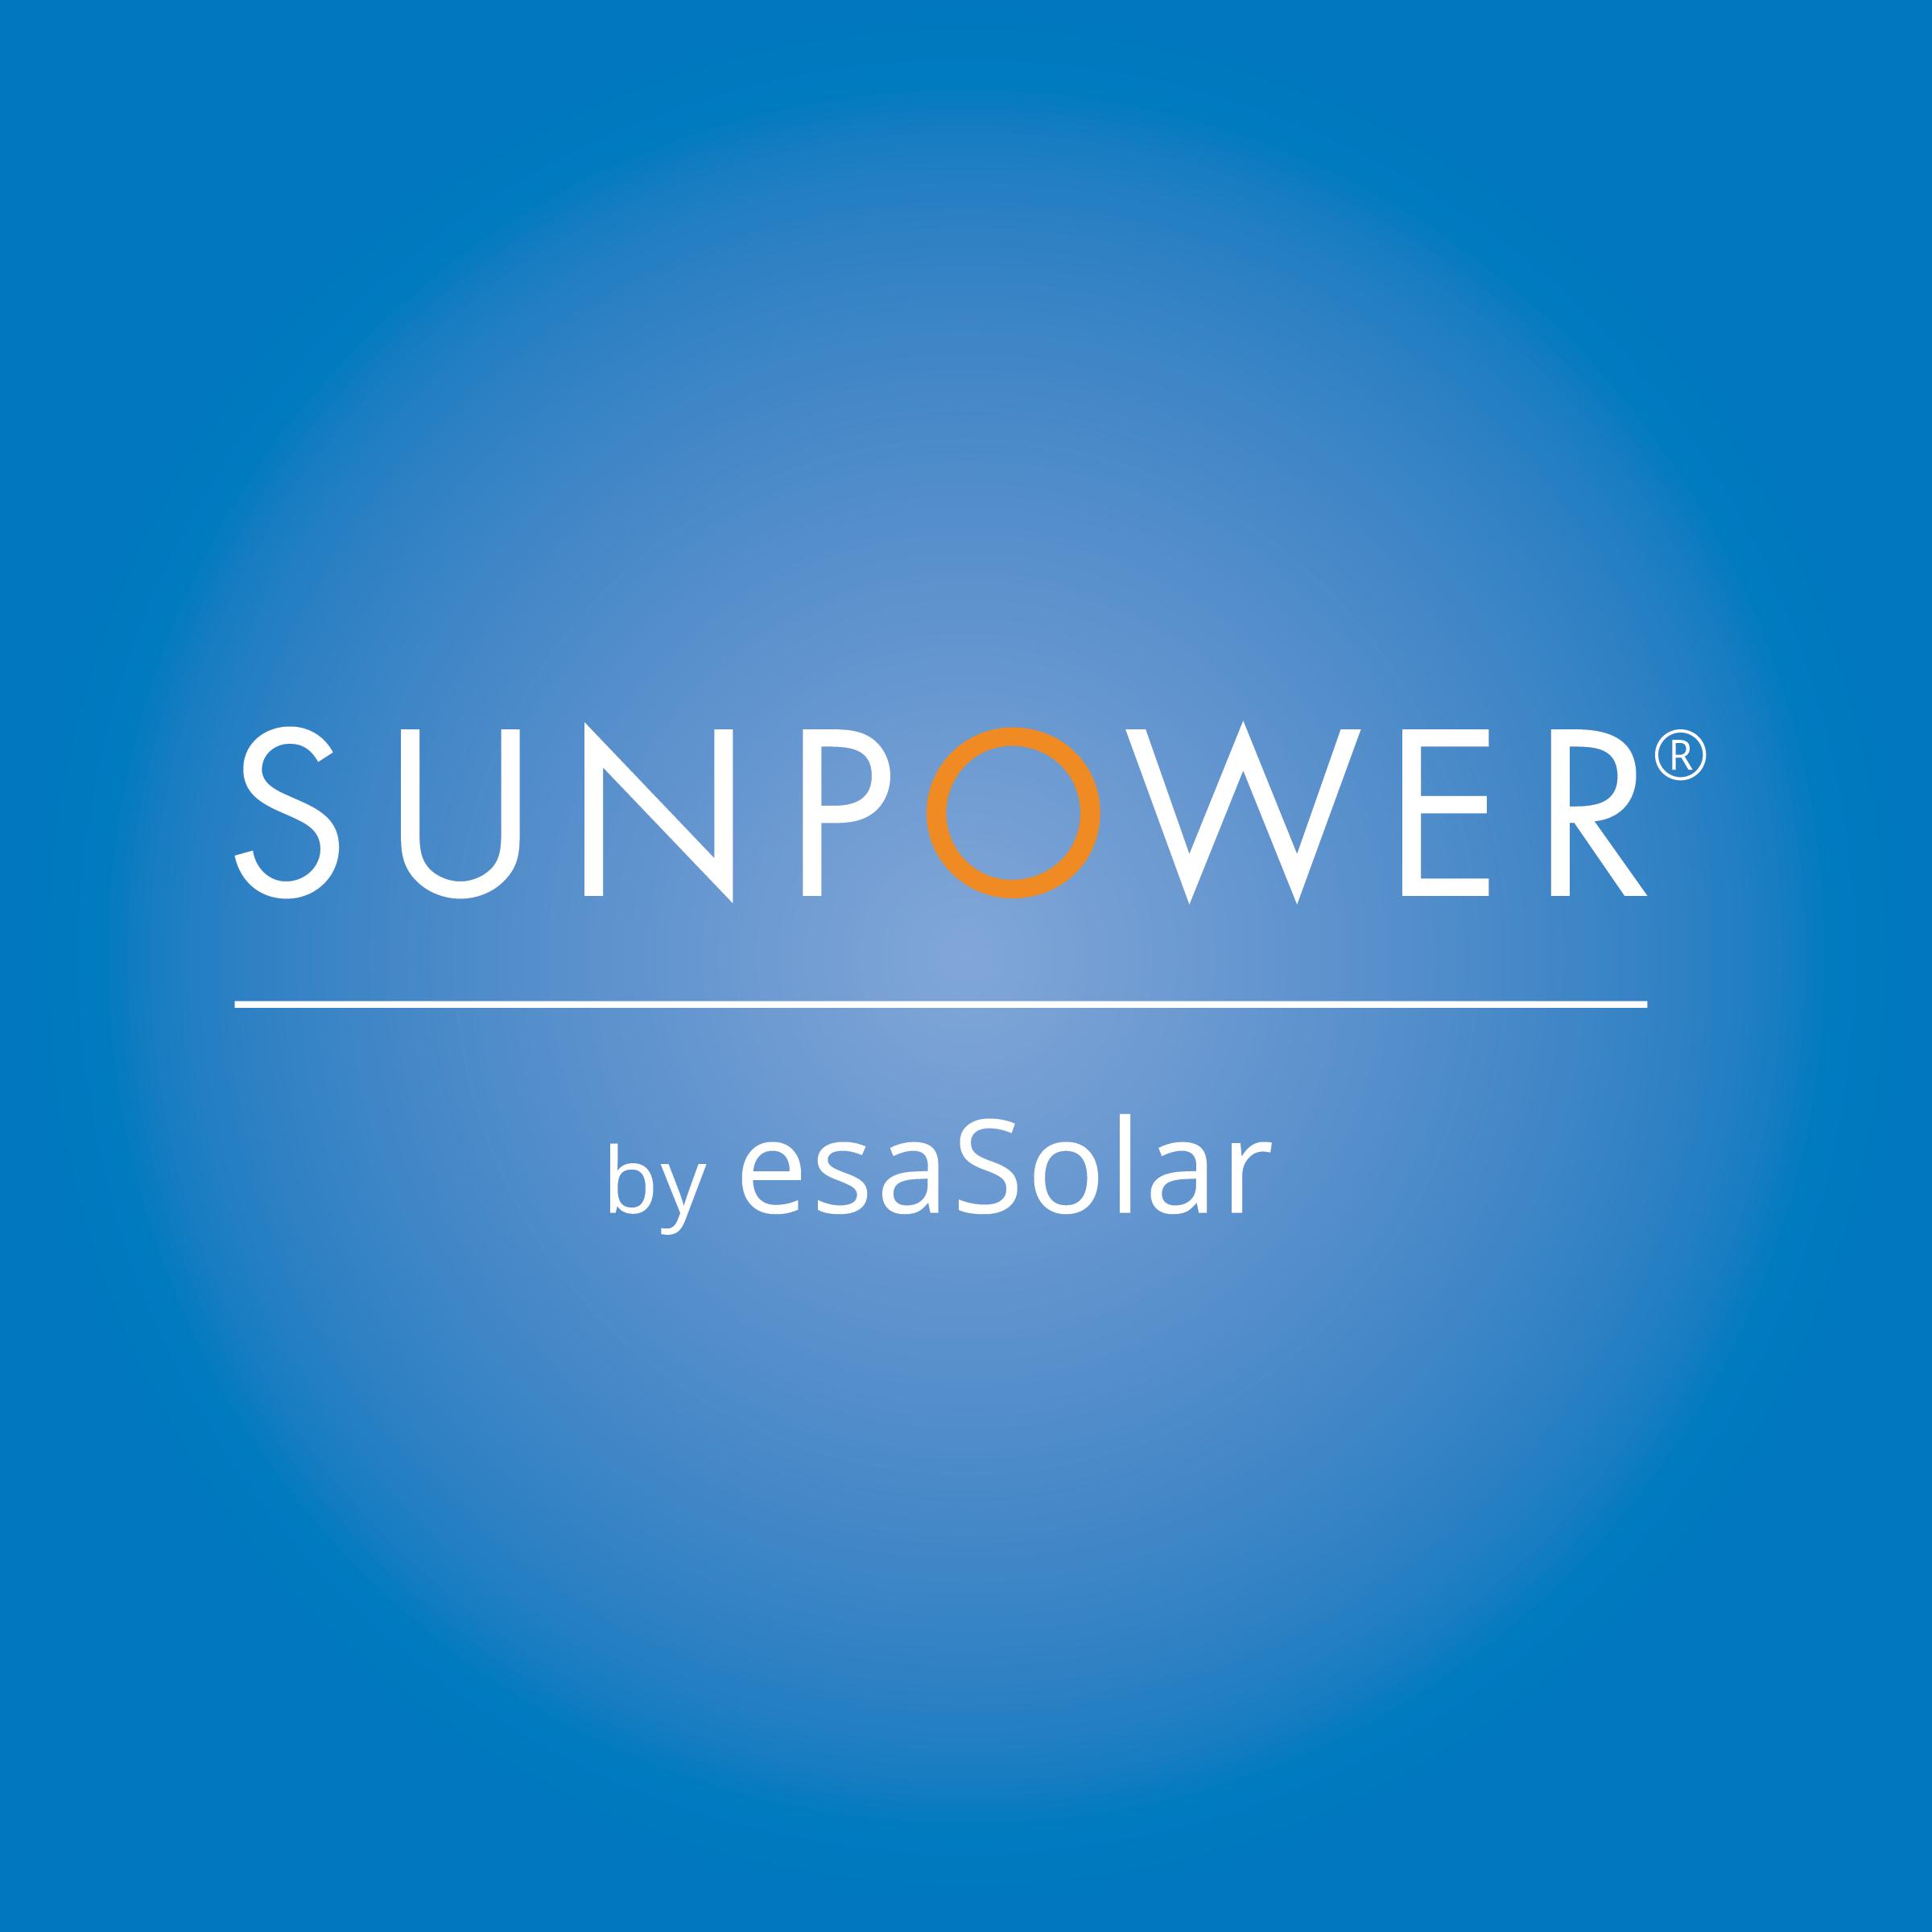 SunPower by esaSolar logo